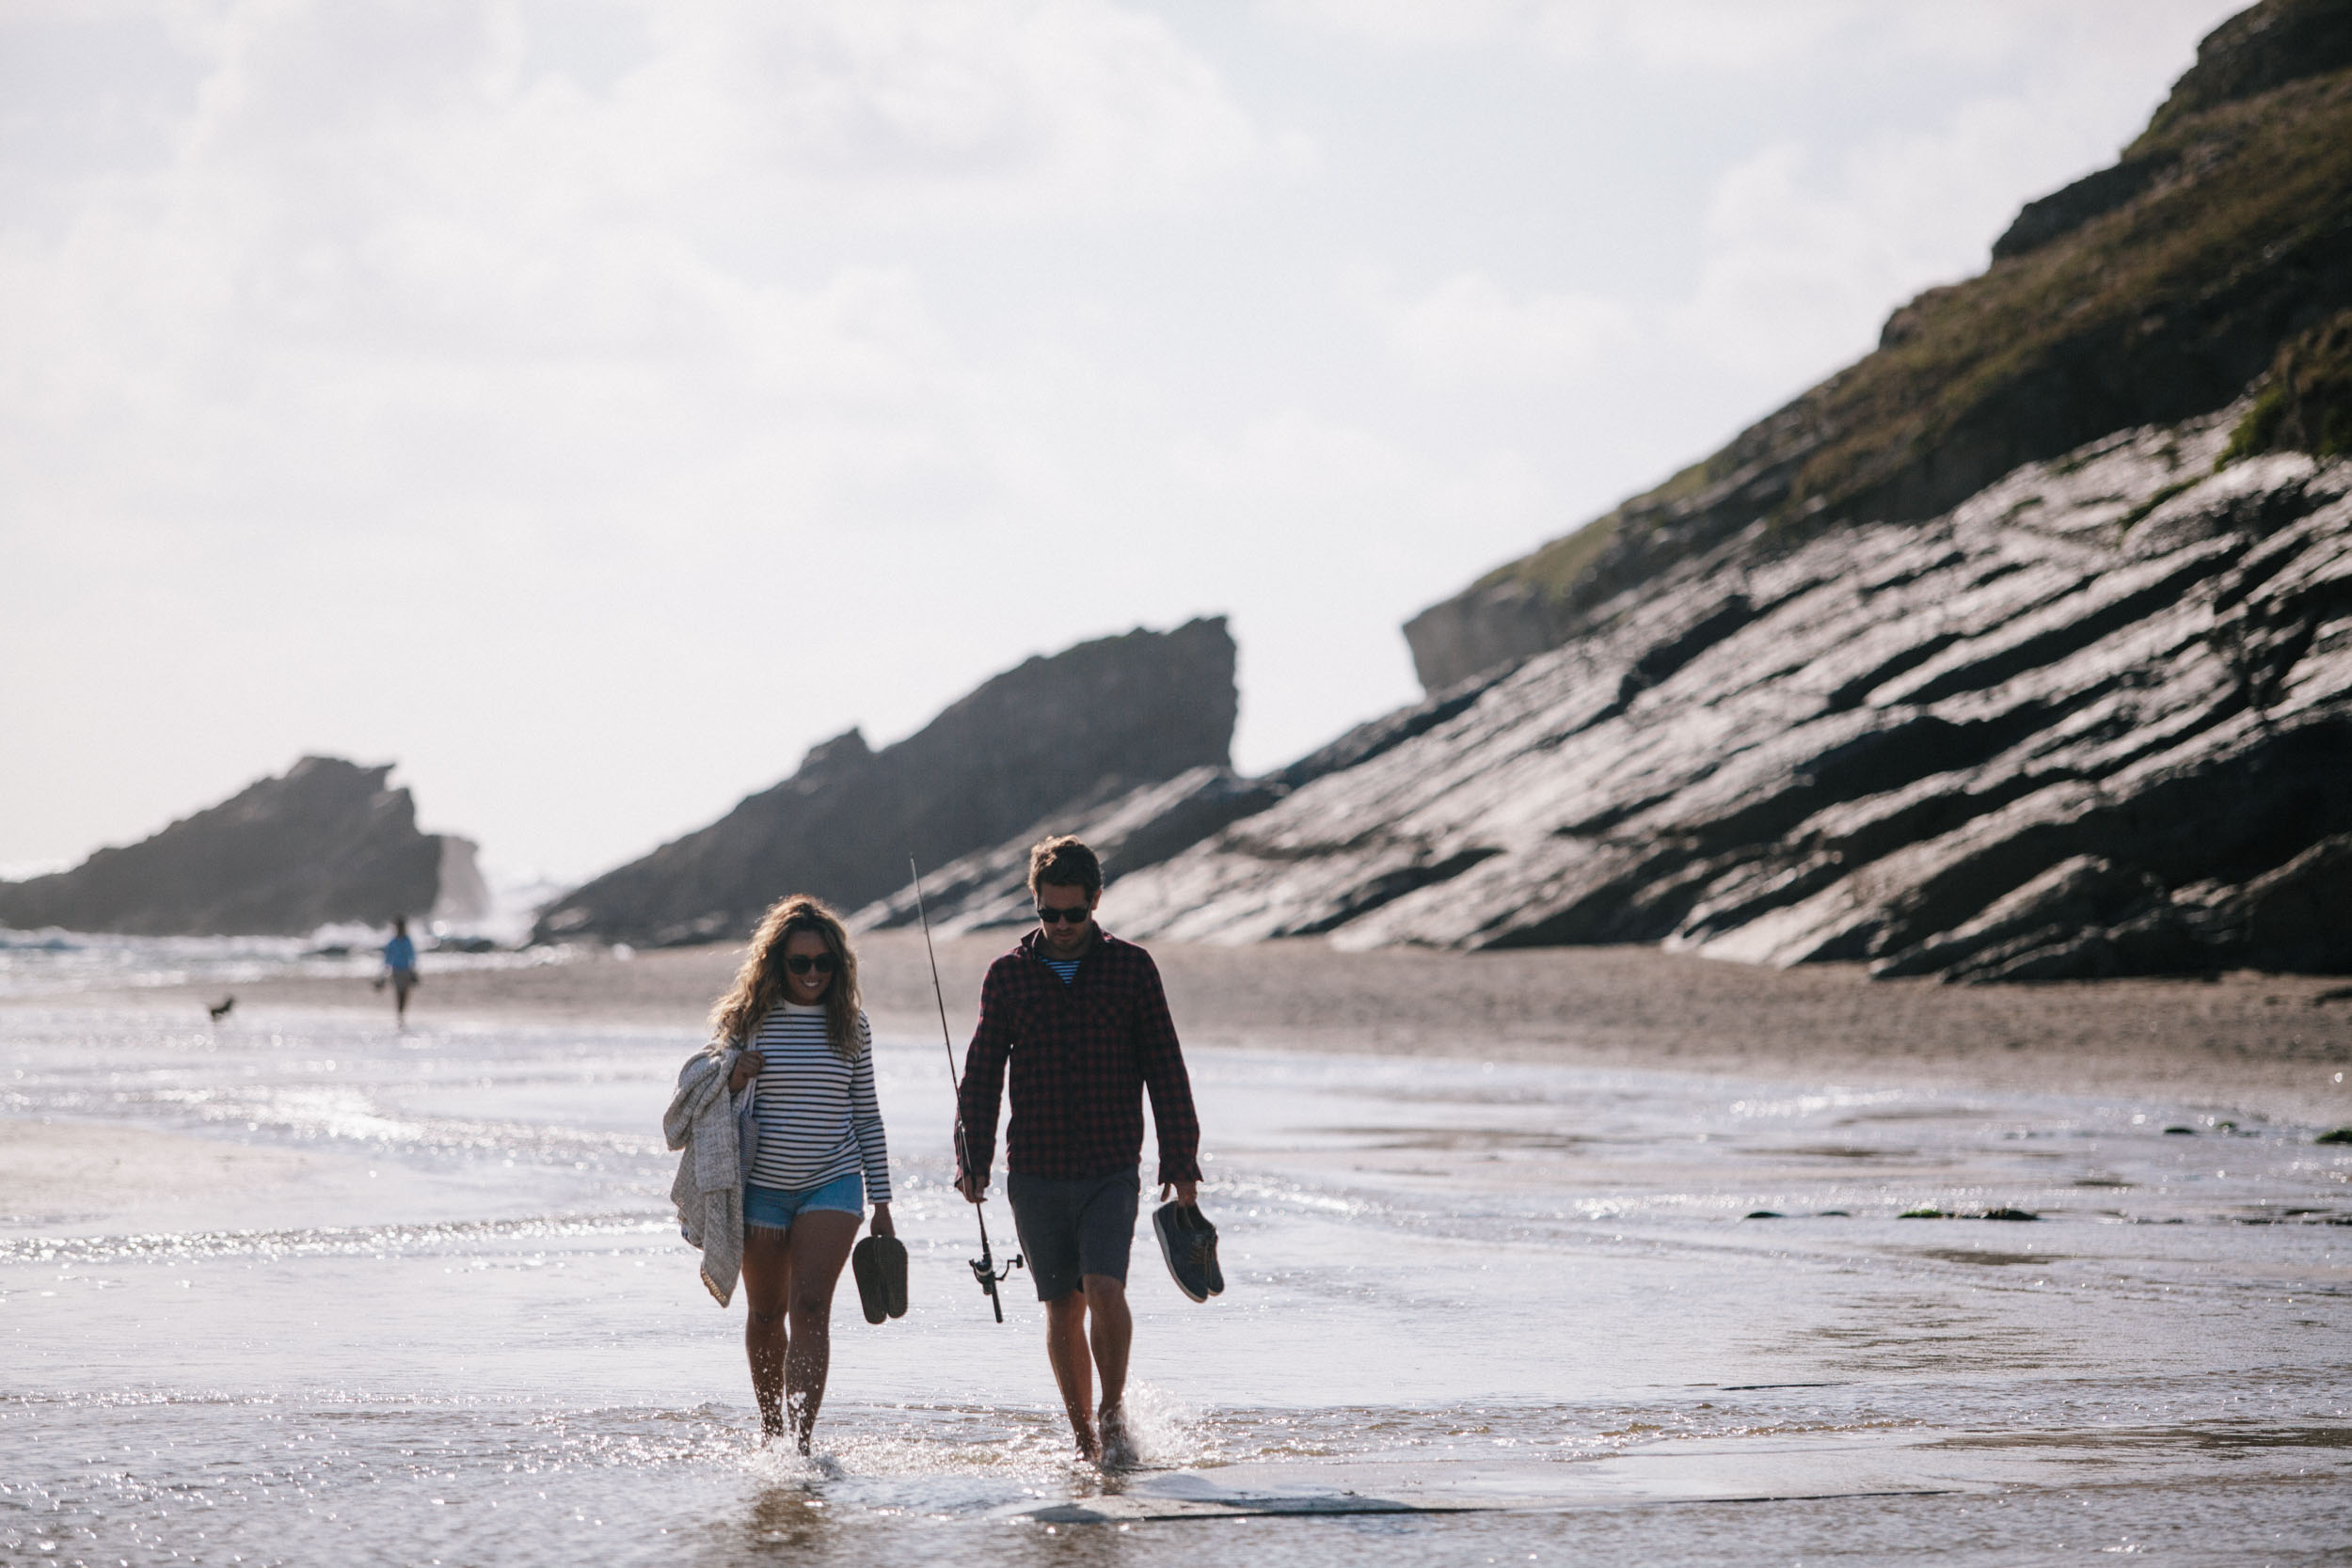 beach-retreats-cornwall-2017-27